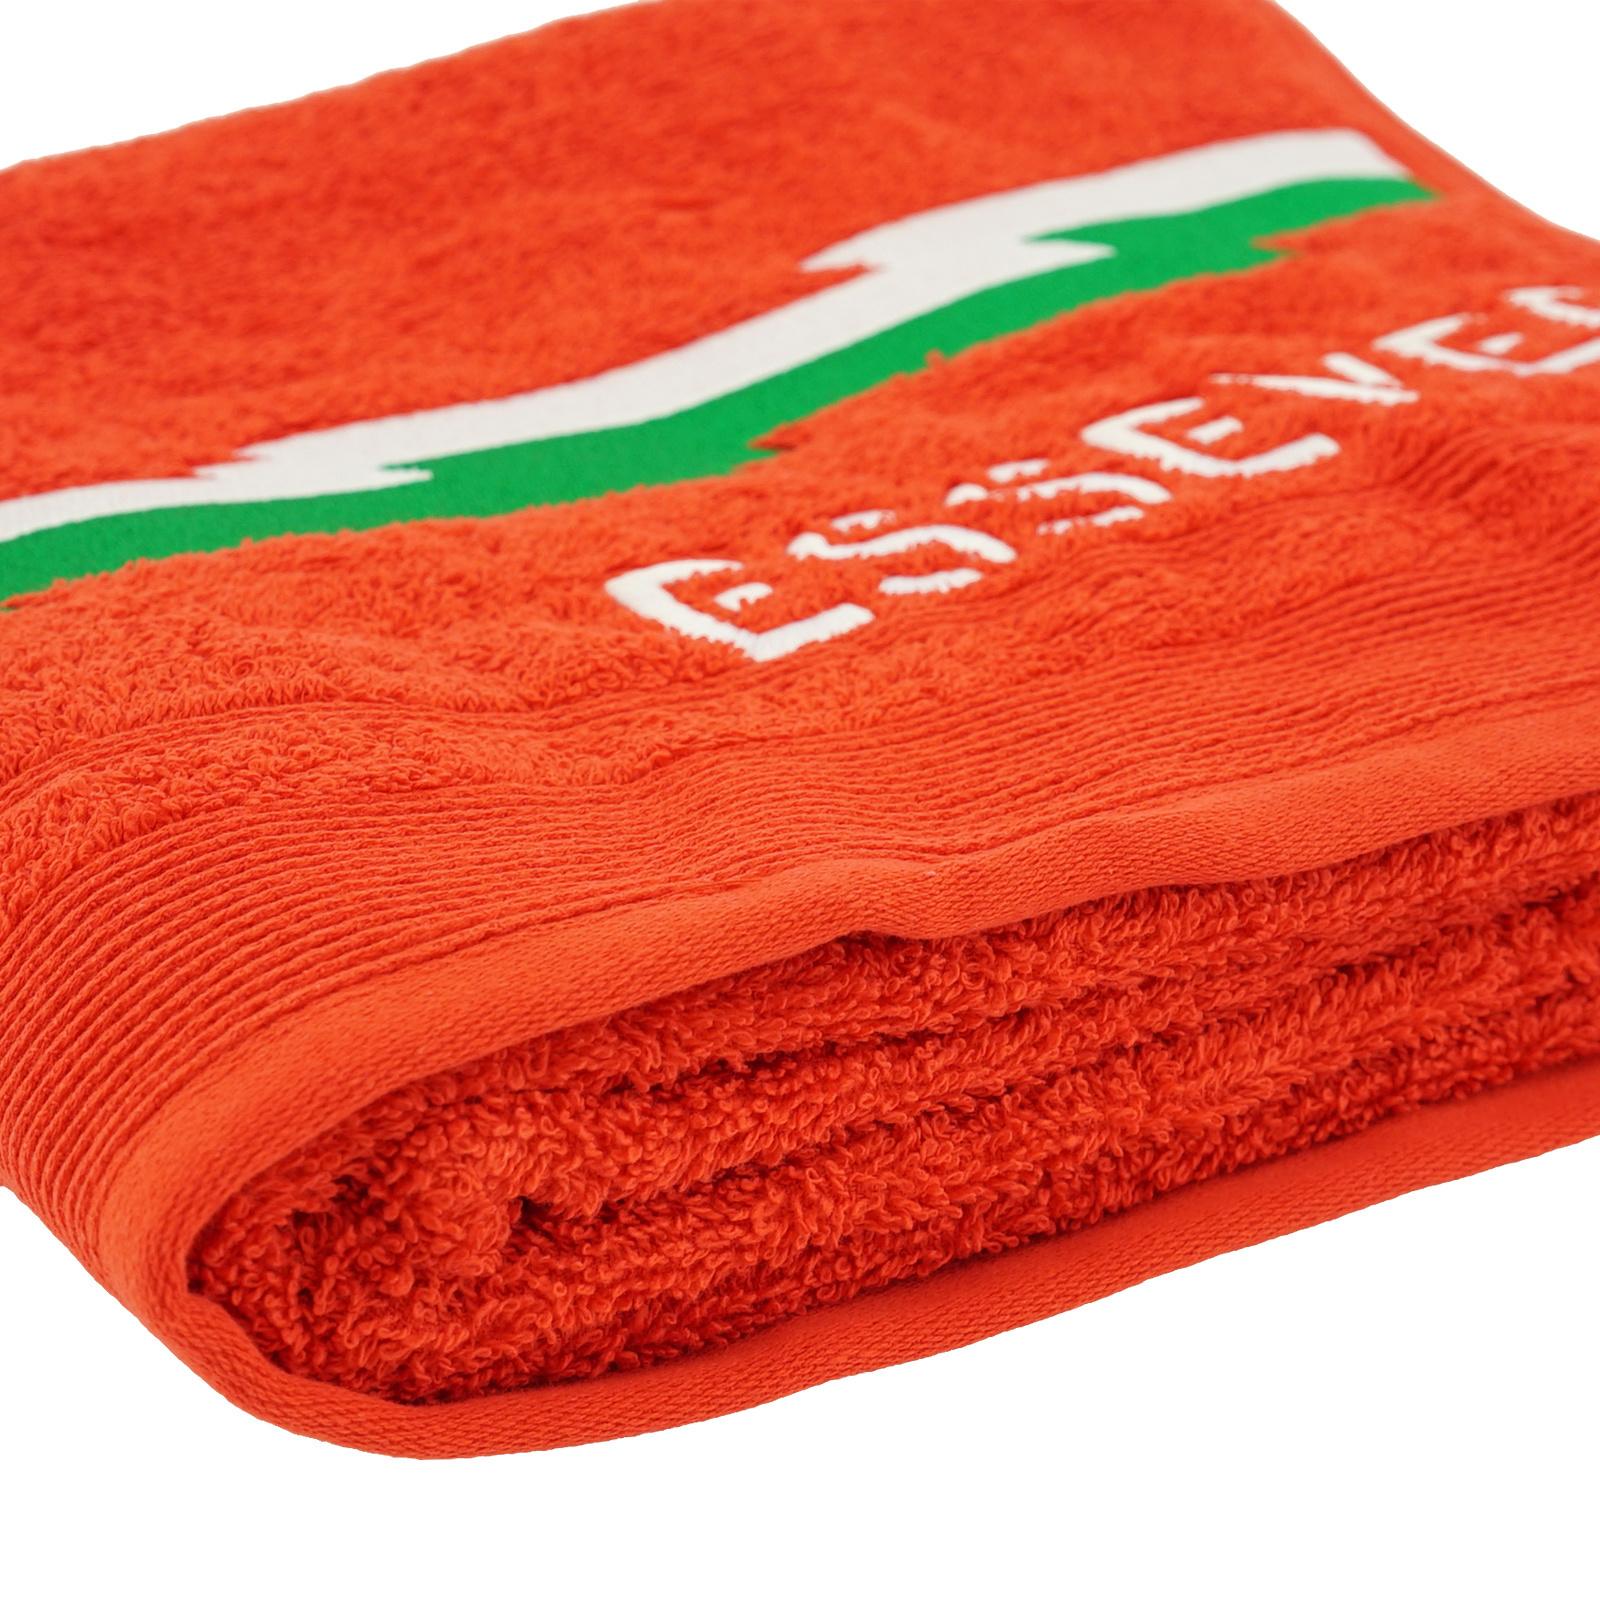 Topfanz Handdoek bliksem groet wit  L